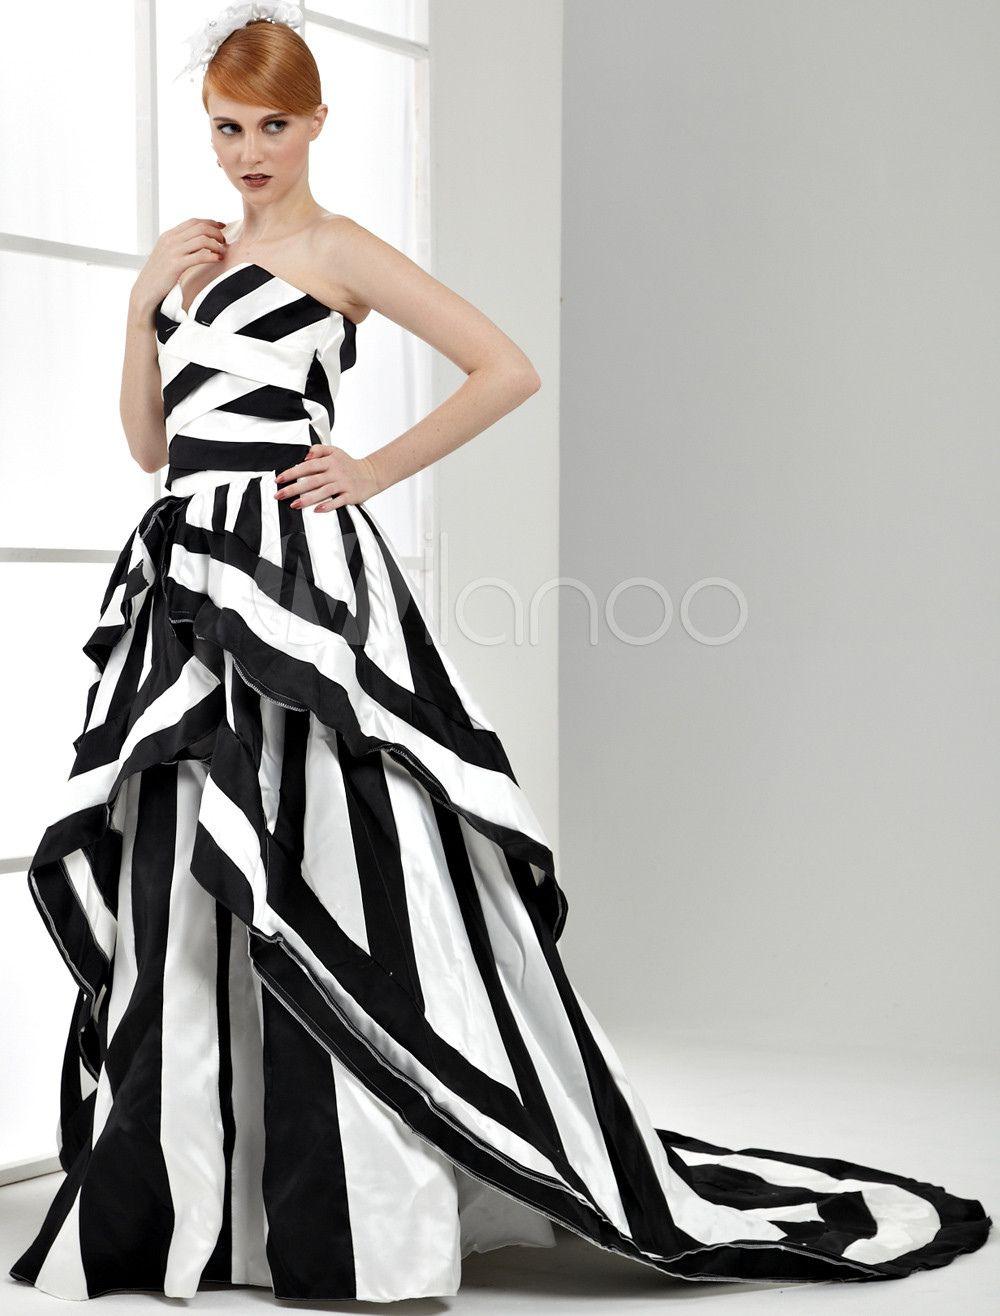 2019 Black and White Striped Wedding Dress - Wedding Dresses for ...